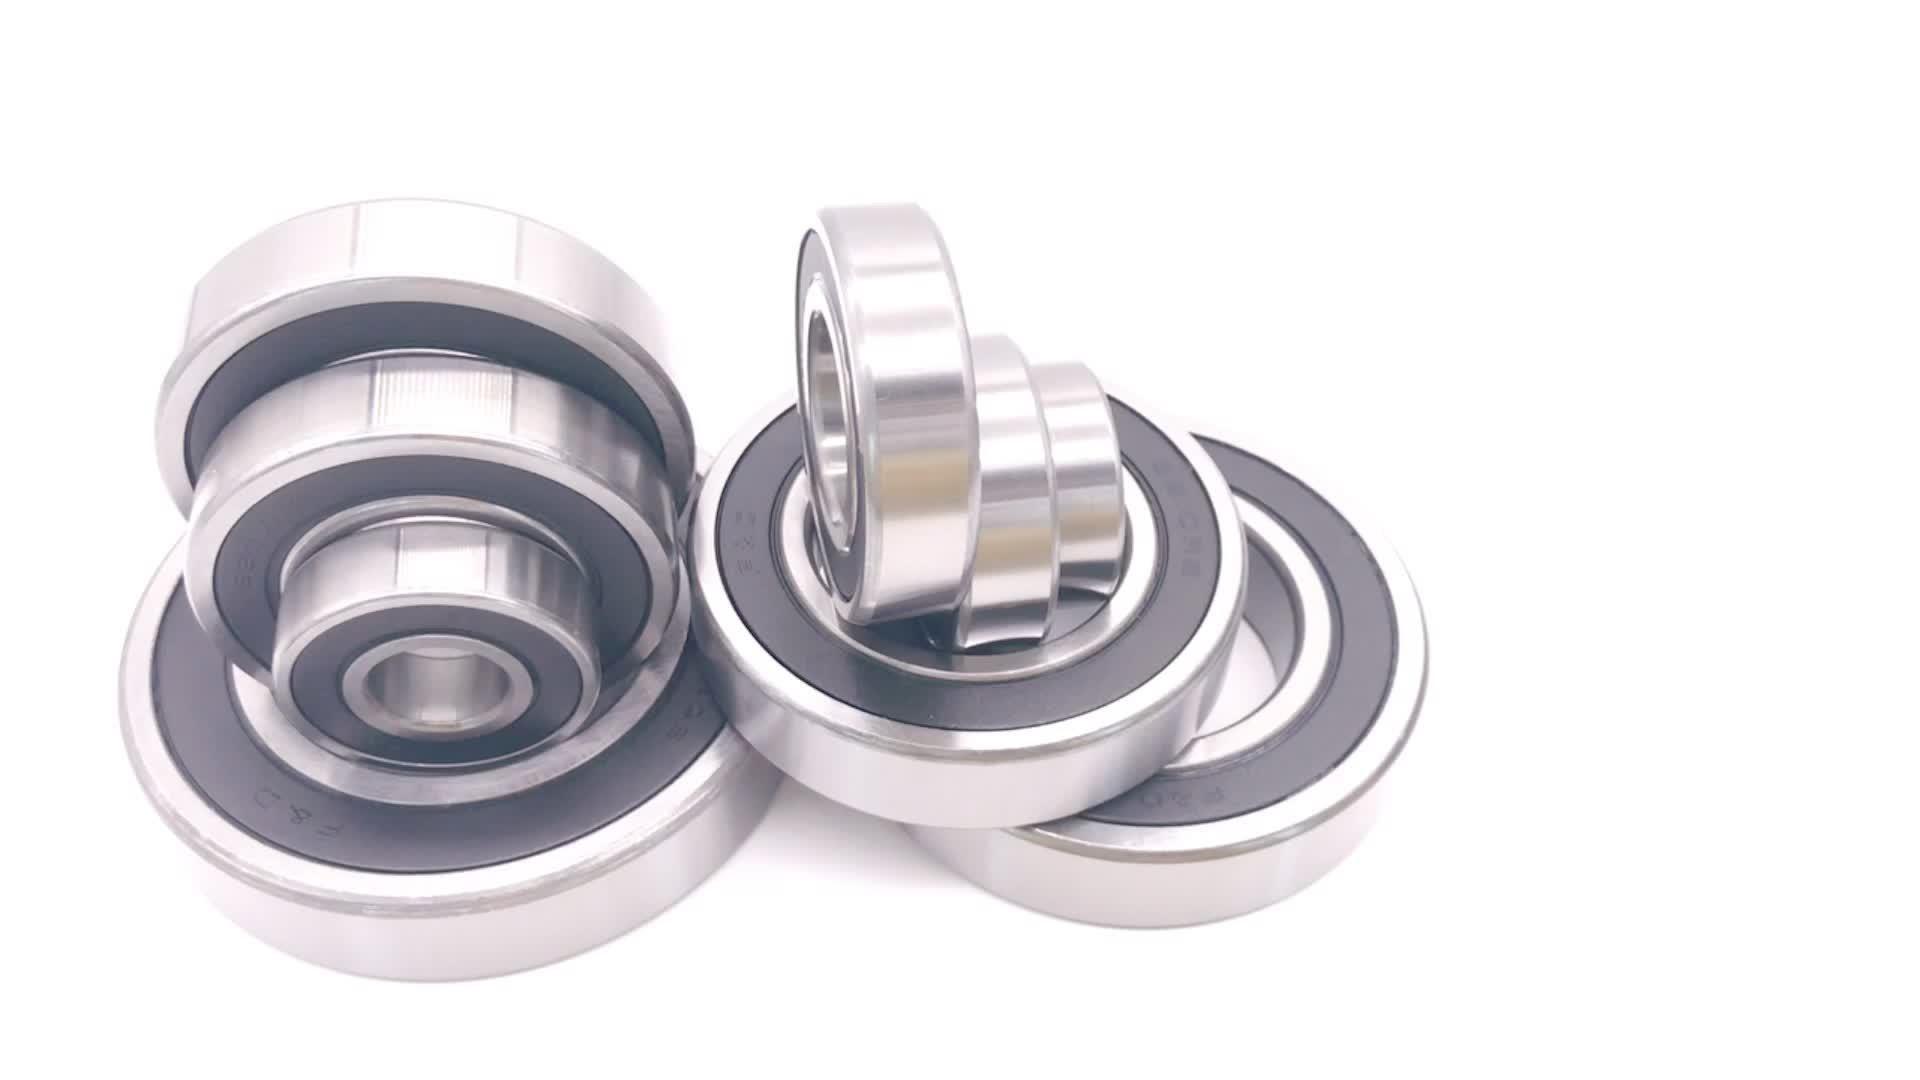 manufacturer bearings 6217-2rs 6217 85*150*28mm rodamientos de bolas